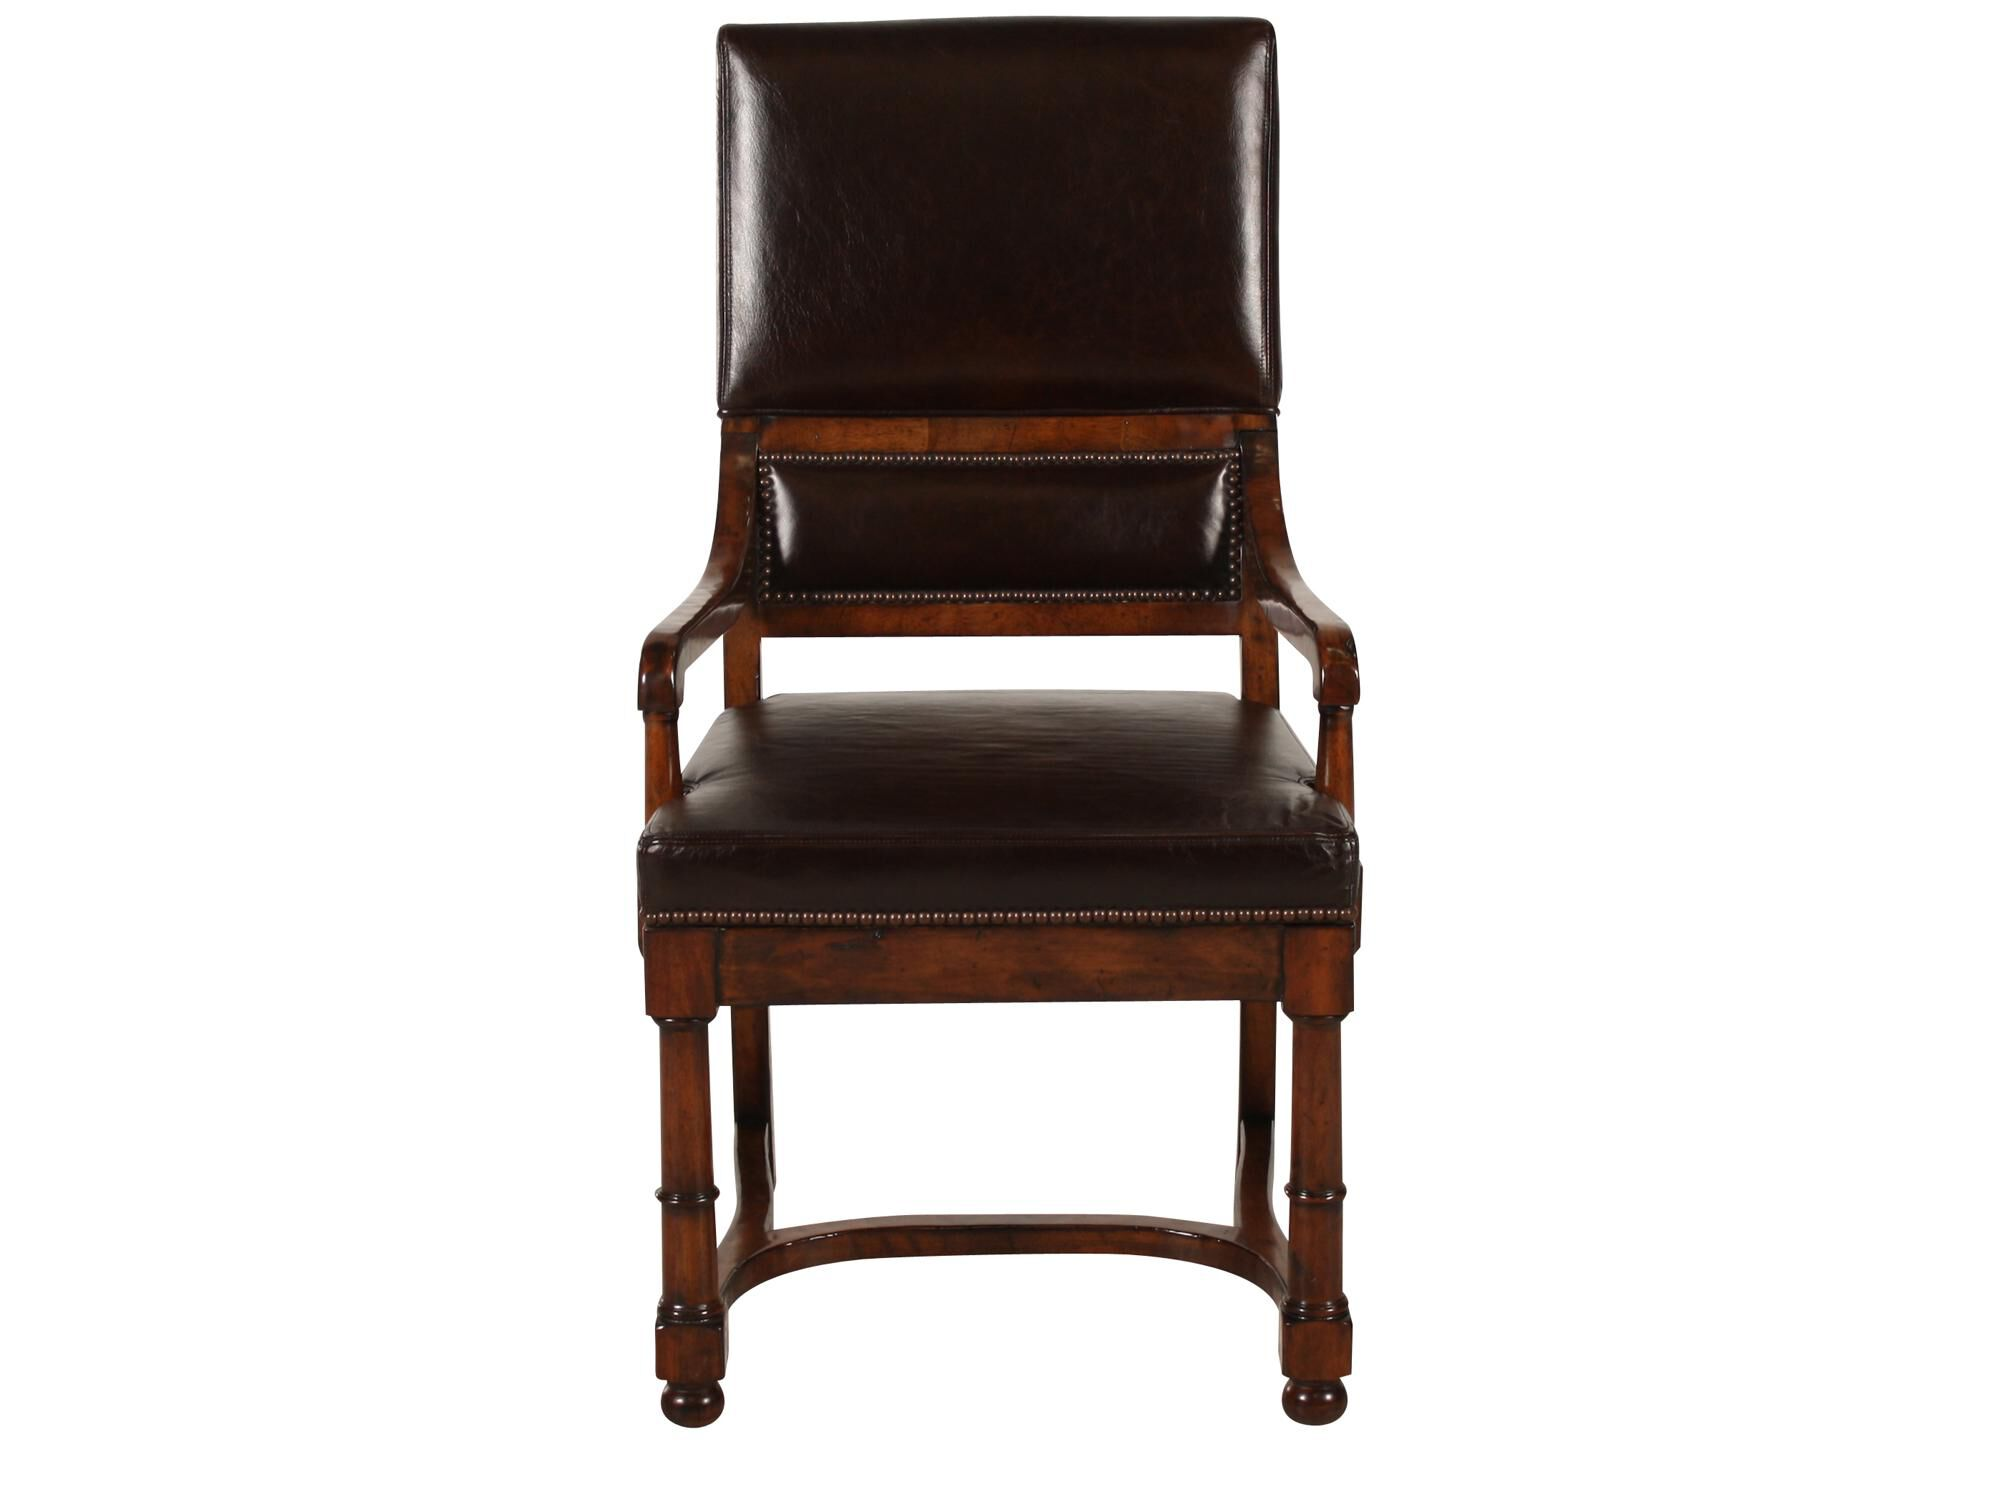 bernhardt brown leather club chair tattoo design vintage patina arm mathis